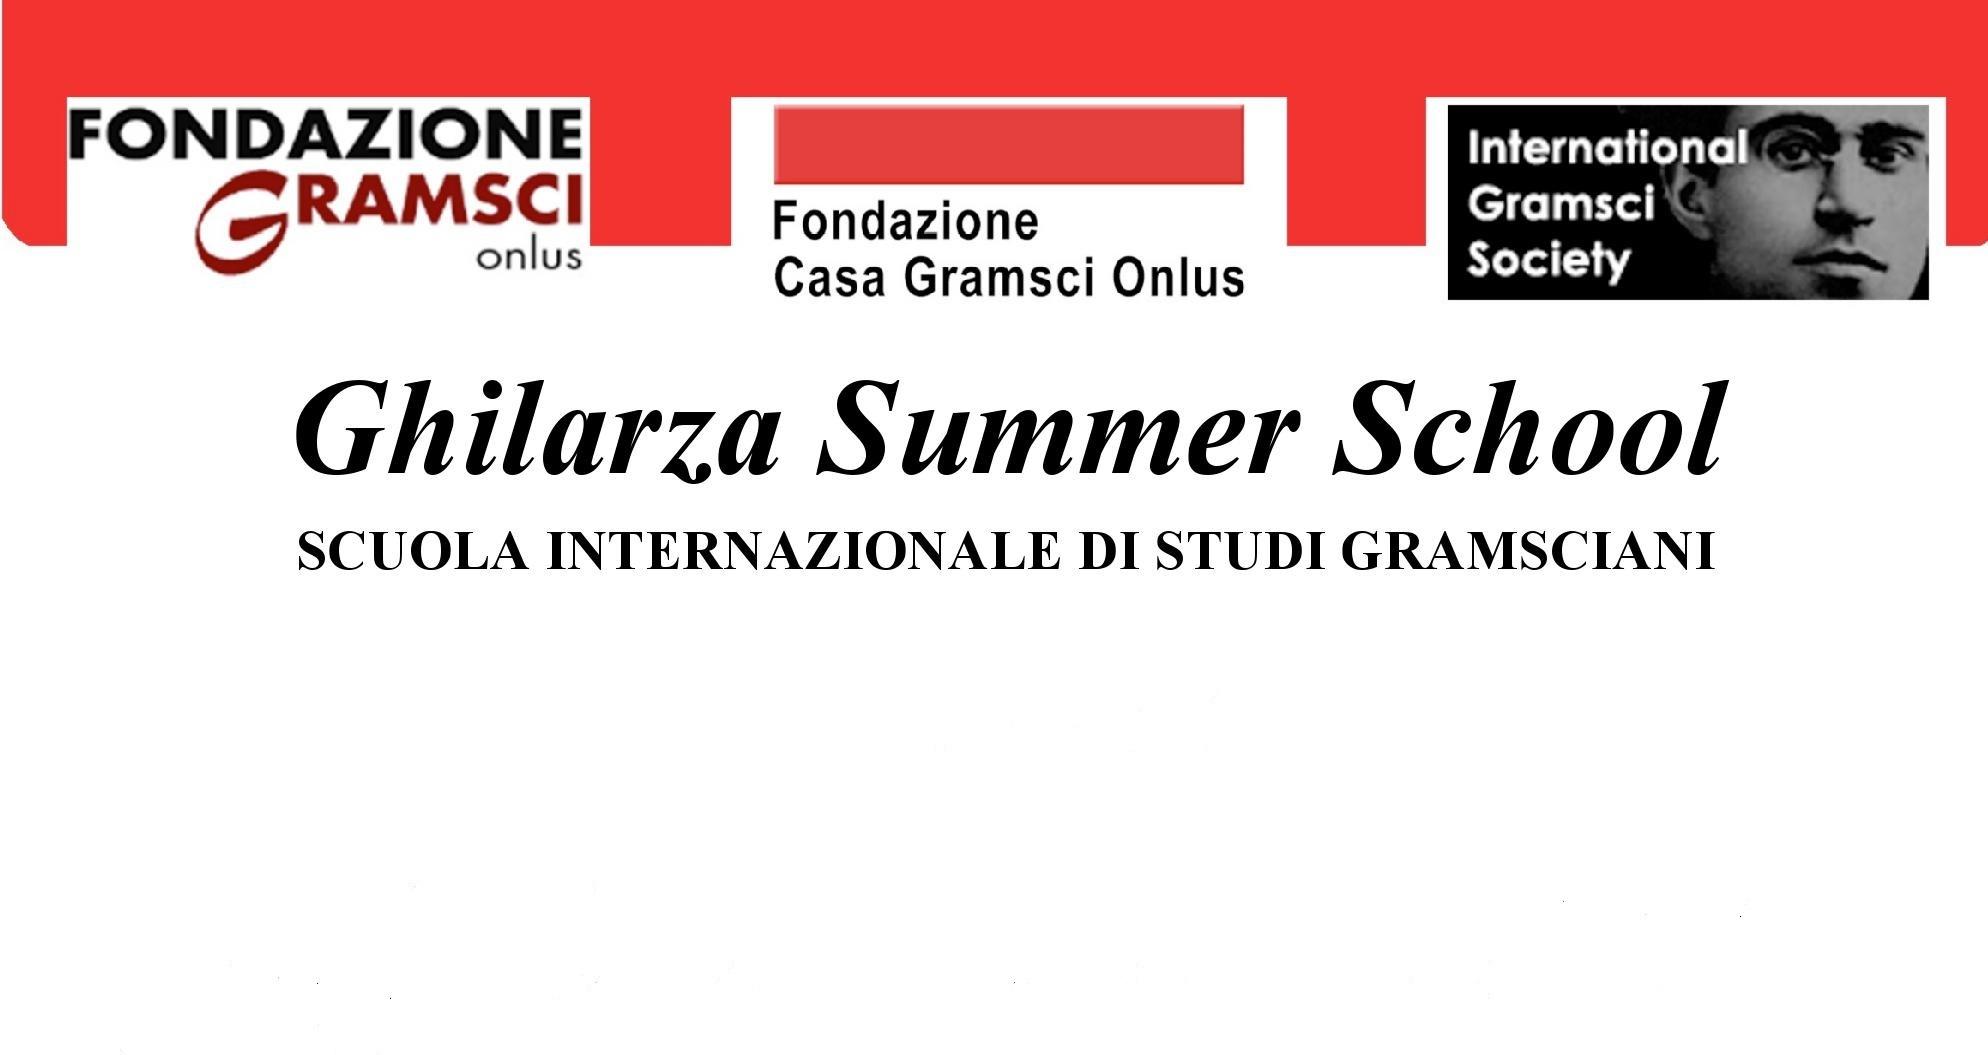 Ghilarza_Summer_School_Edizione_2018